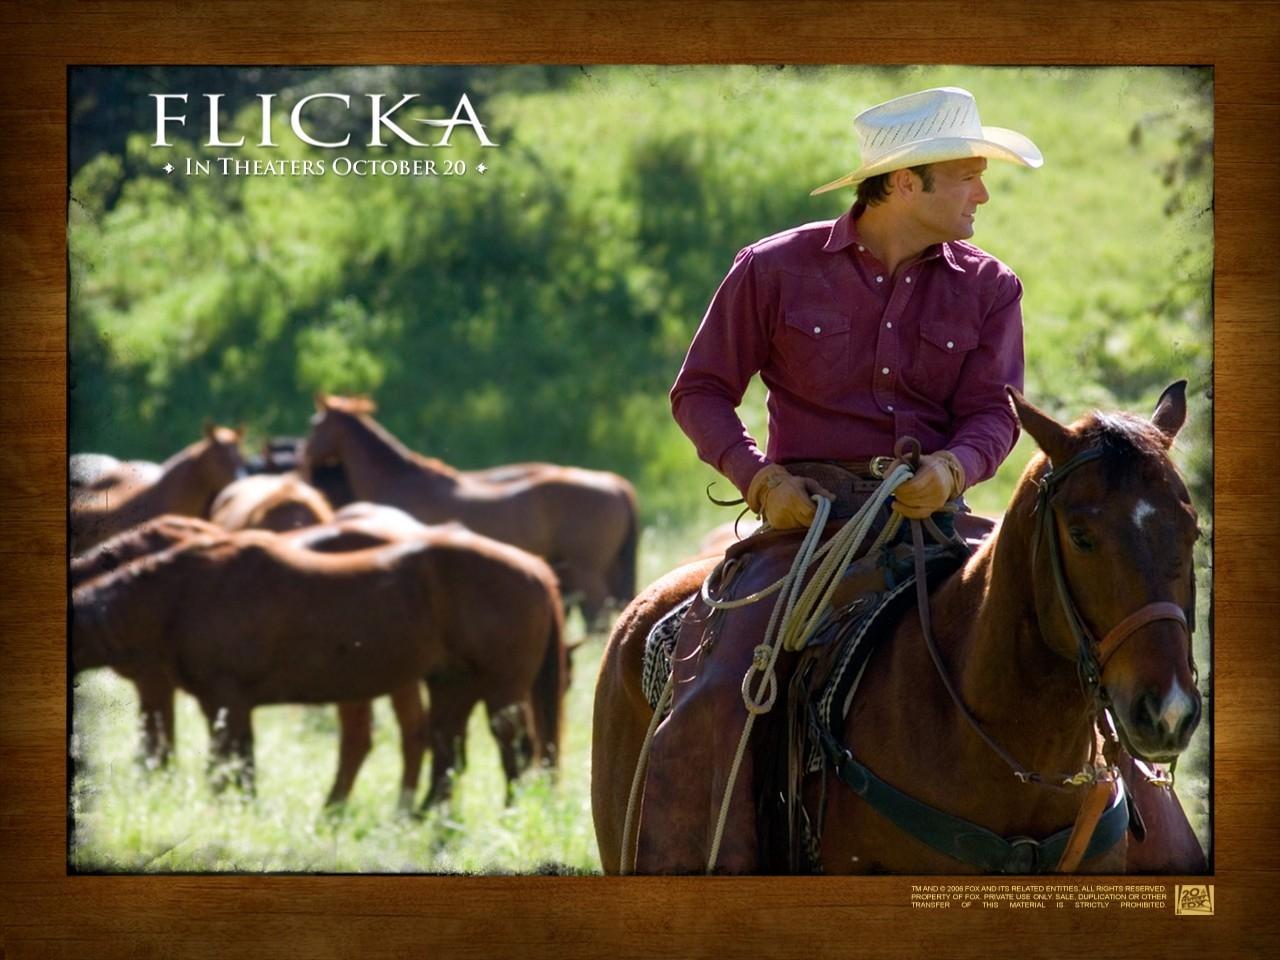 Un wallpaper del film Flicka - Uno Spirito libero